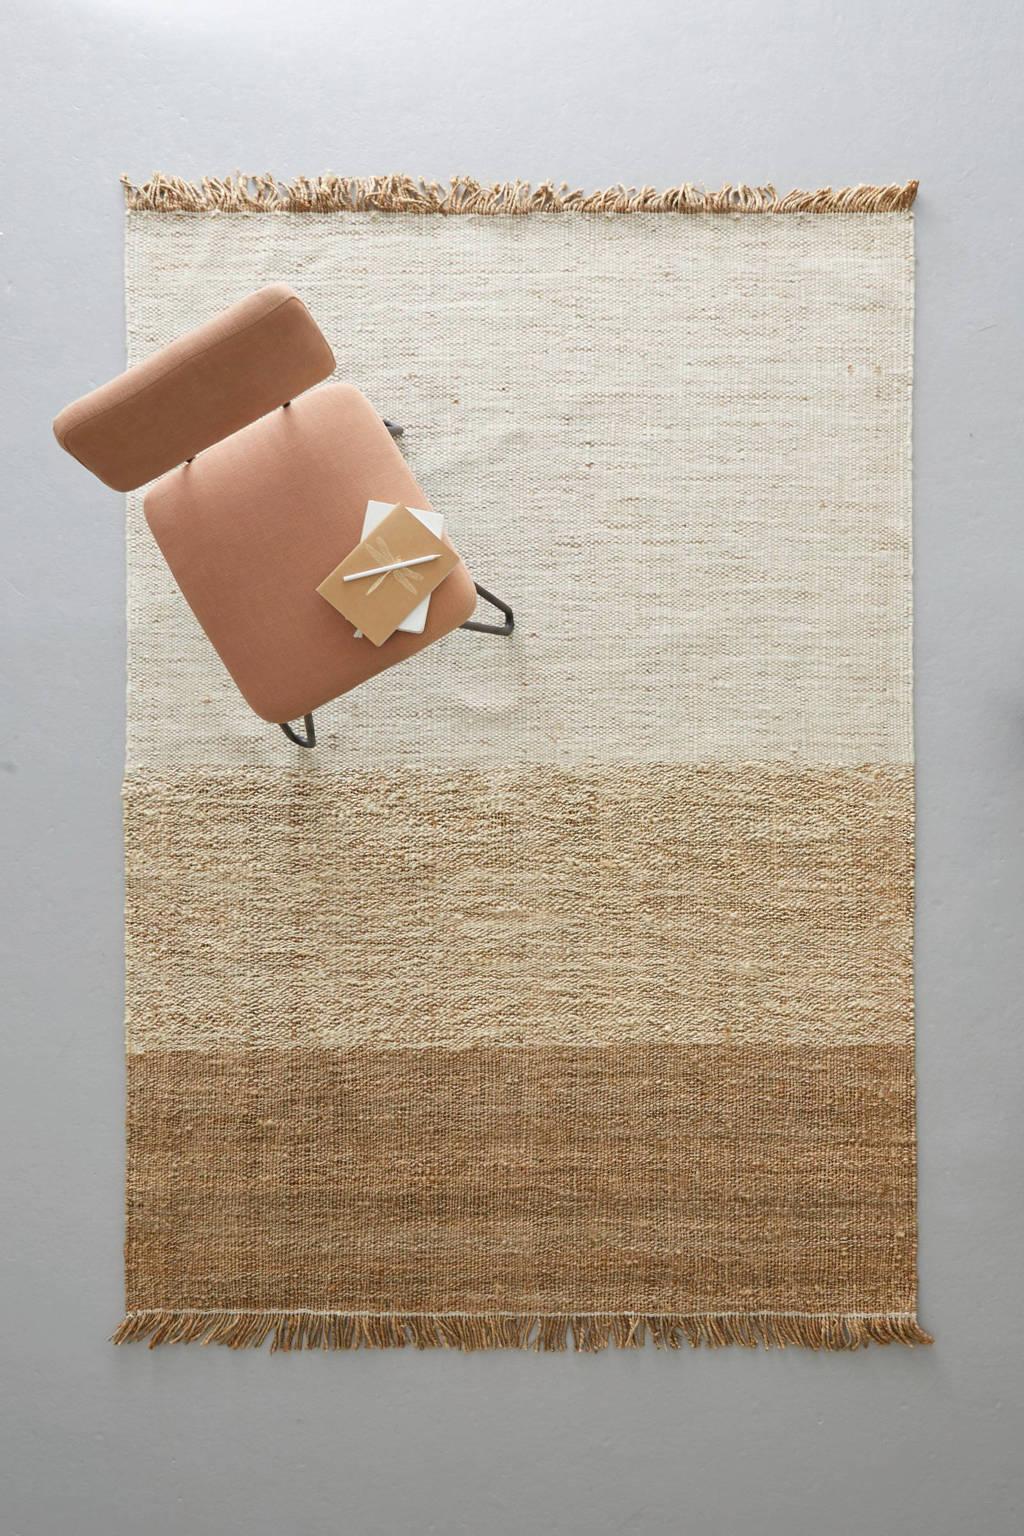 whkmp's own vloerkleed Sicco  (290x200 cm)